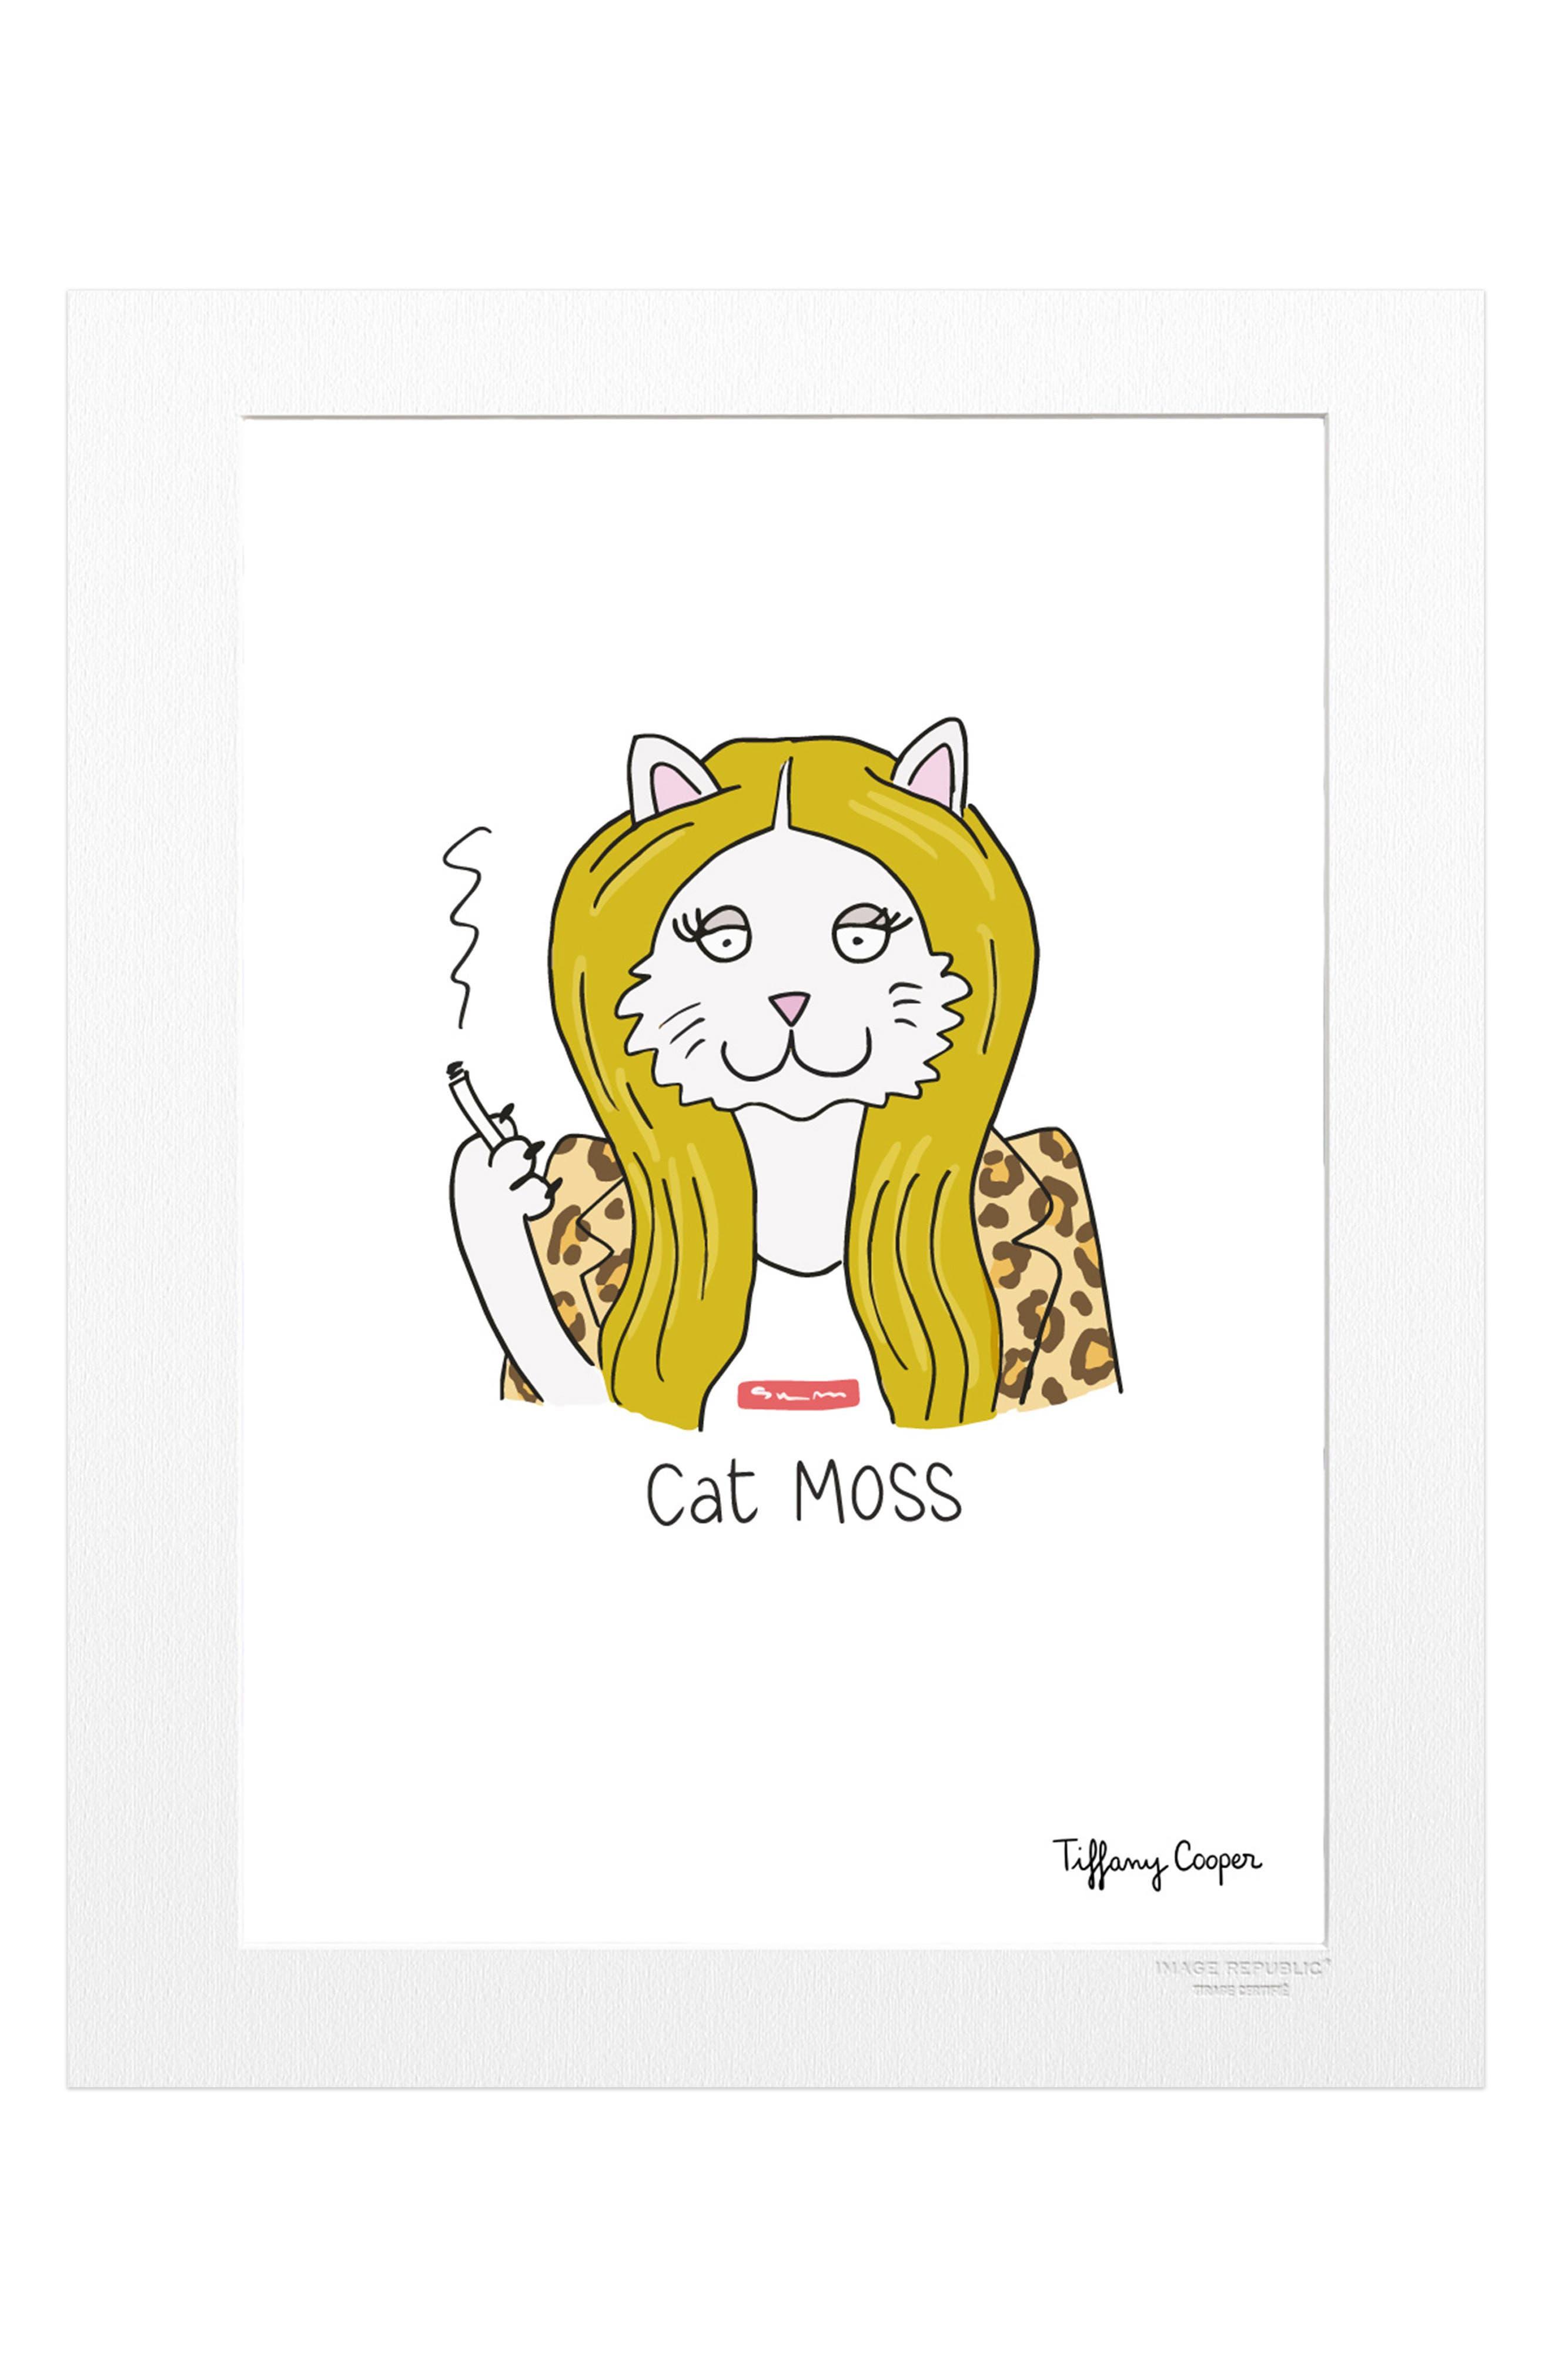 Alternate Image 1 Selected - Image Republic Tiffany Cat Moss Print